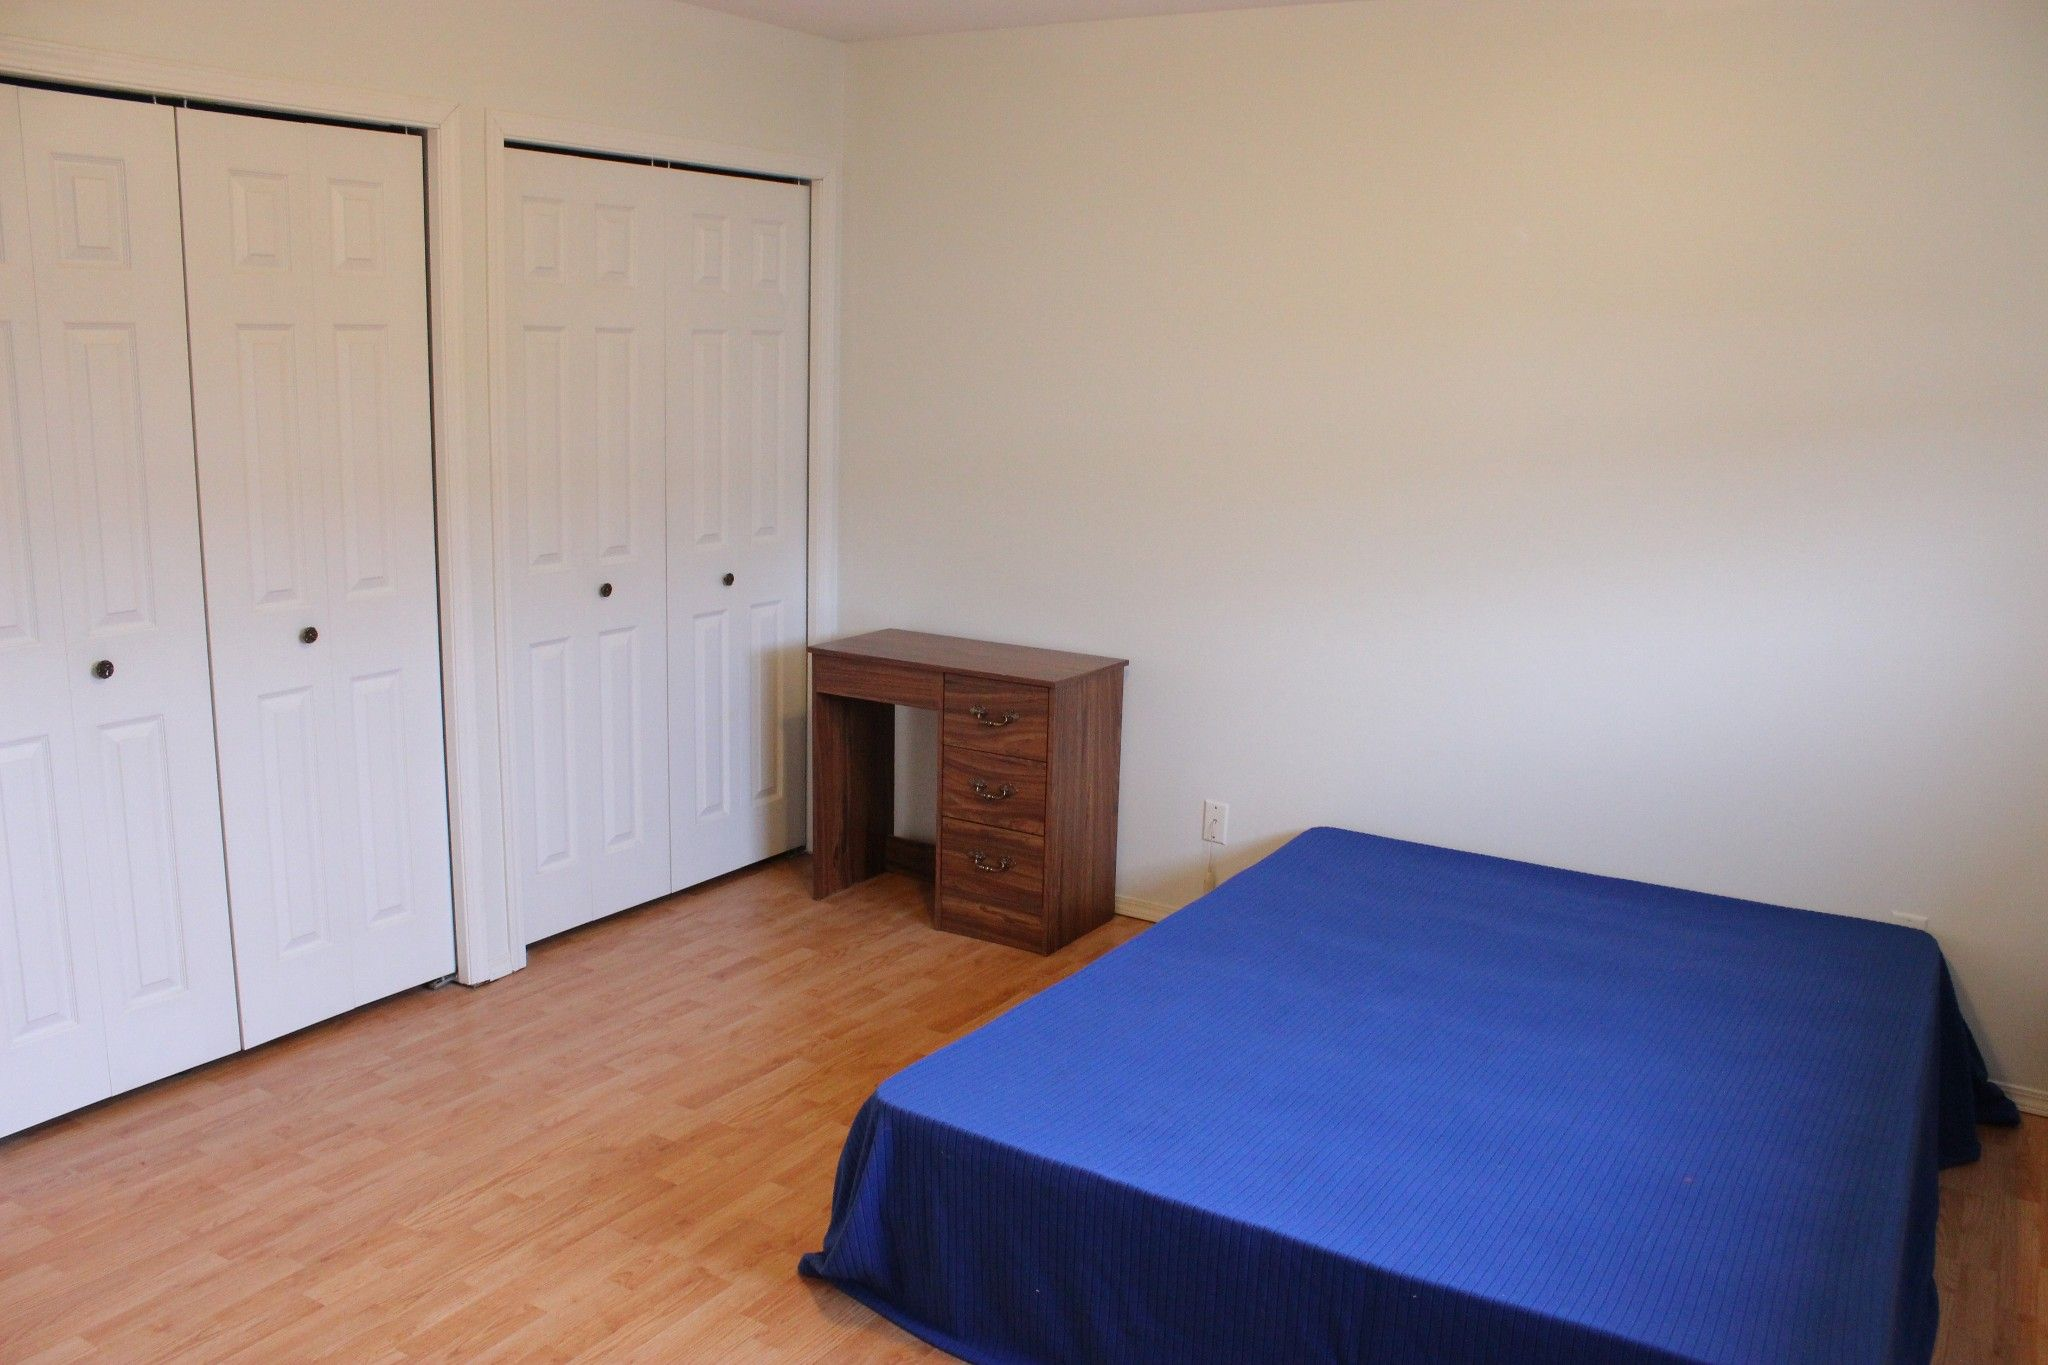 Photo 8: Photos: 6725 Heffley Road in Kamloops: Heffley House for sale : MLS®# 160007